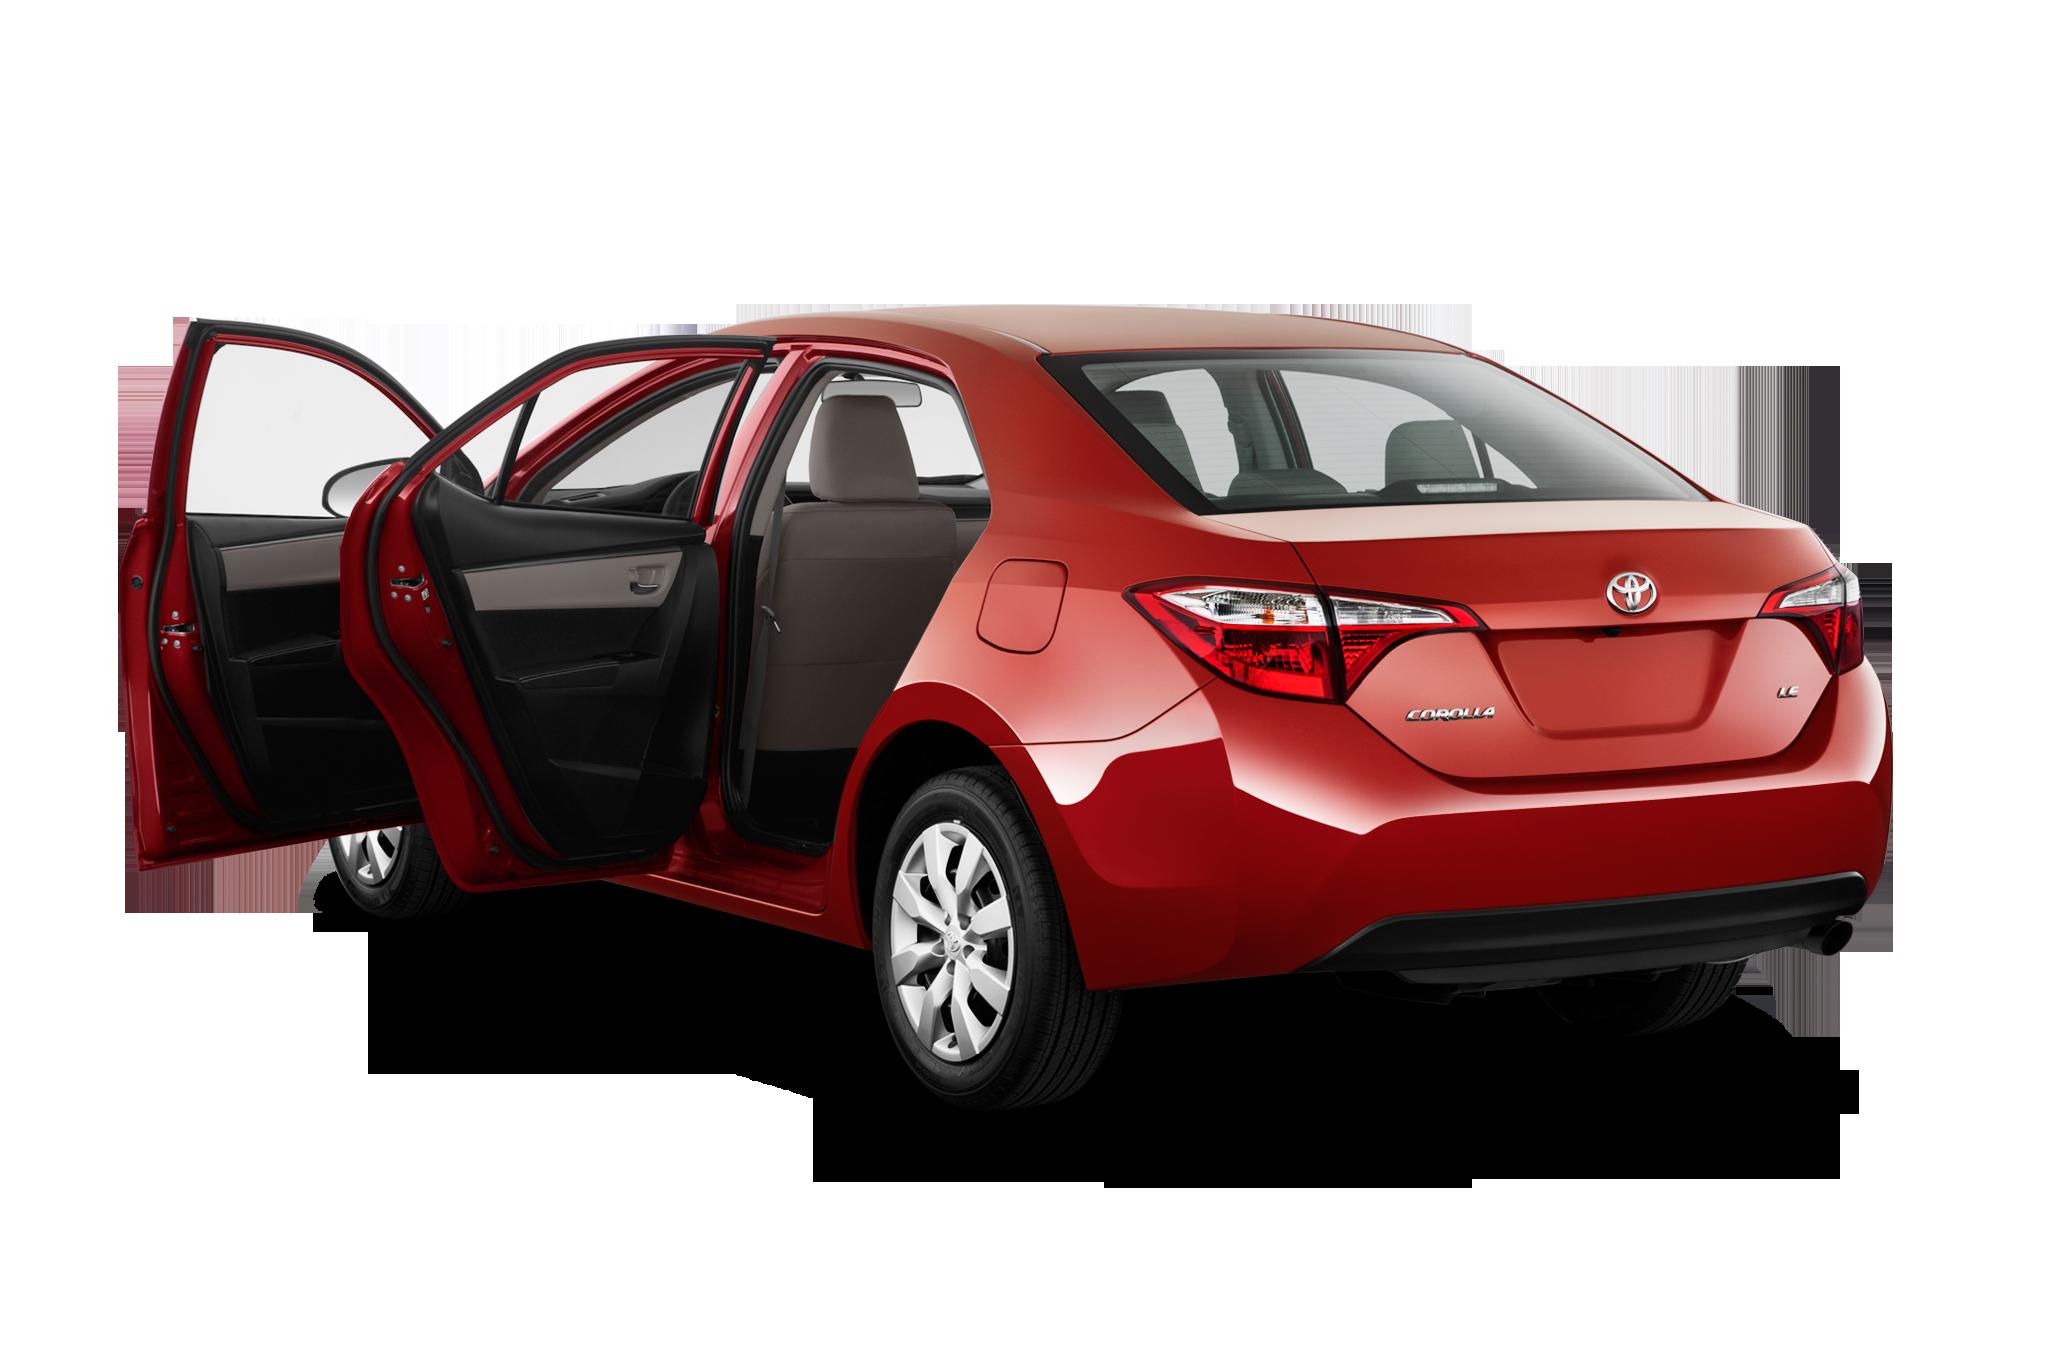 toyota corolla tops 2014 compact car sales. Black Bedroom Furniture Sets. Home Design Ideas